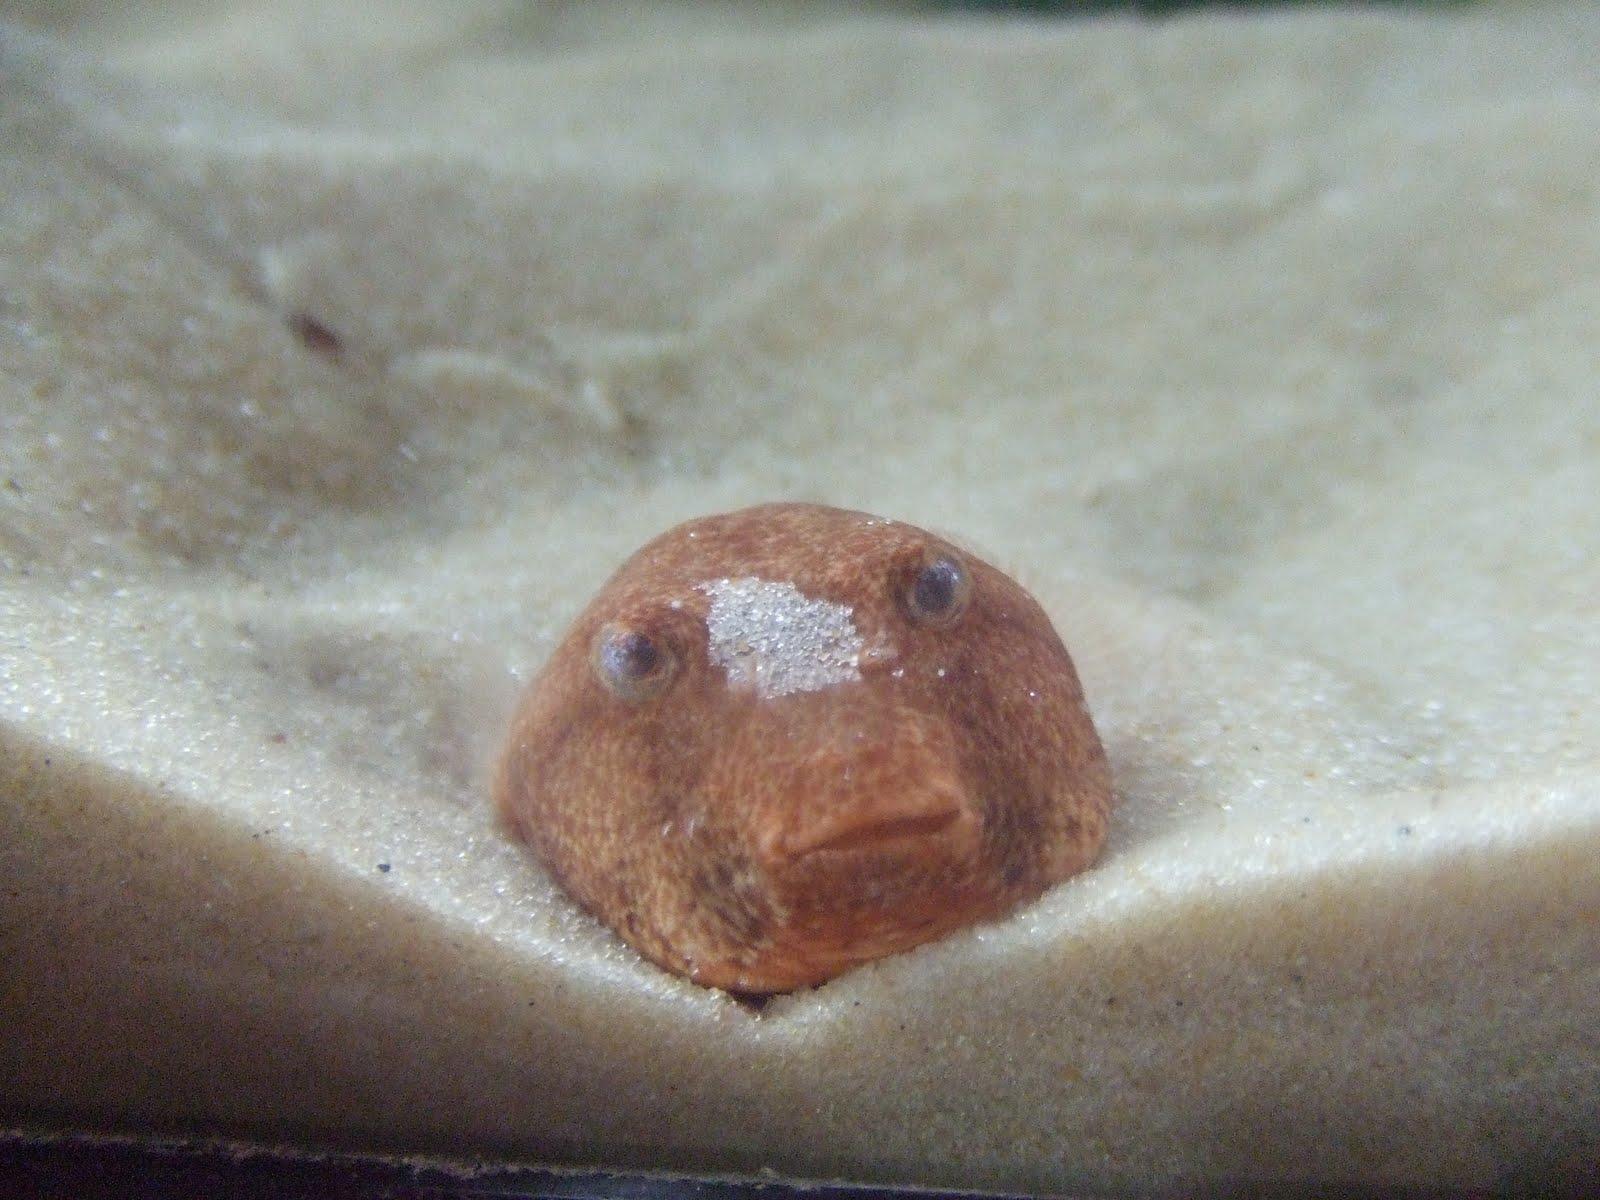 Lilacamys Puffer Family: Ushmew the Congo Puffer - Tetraodon miurus